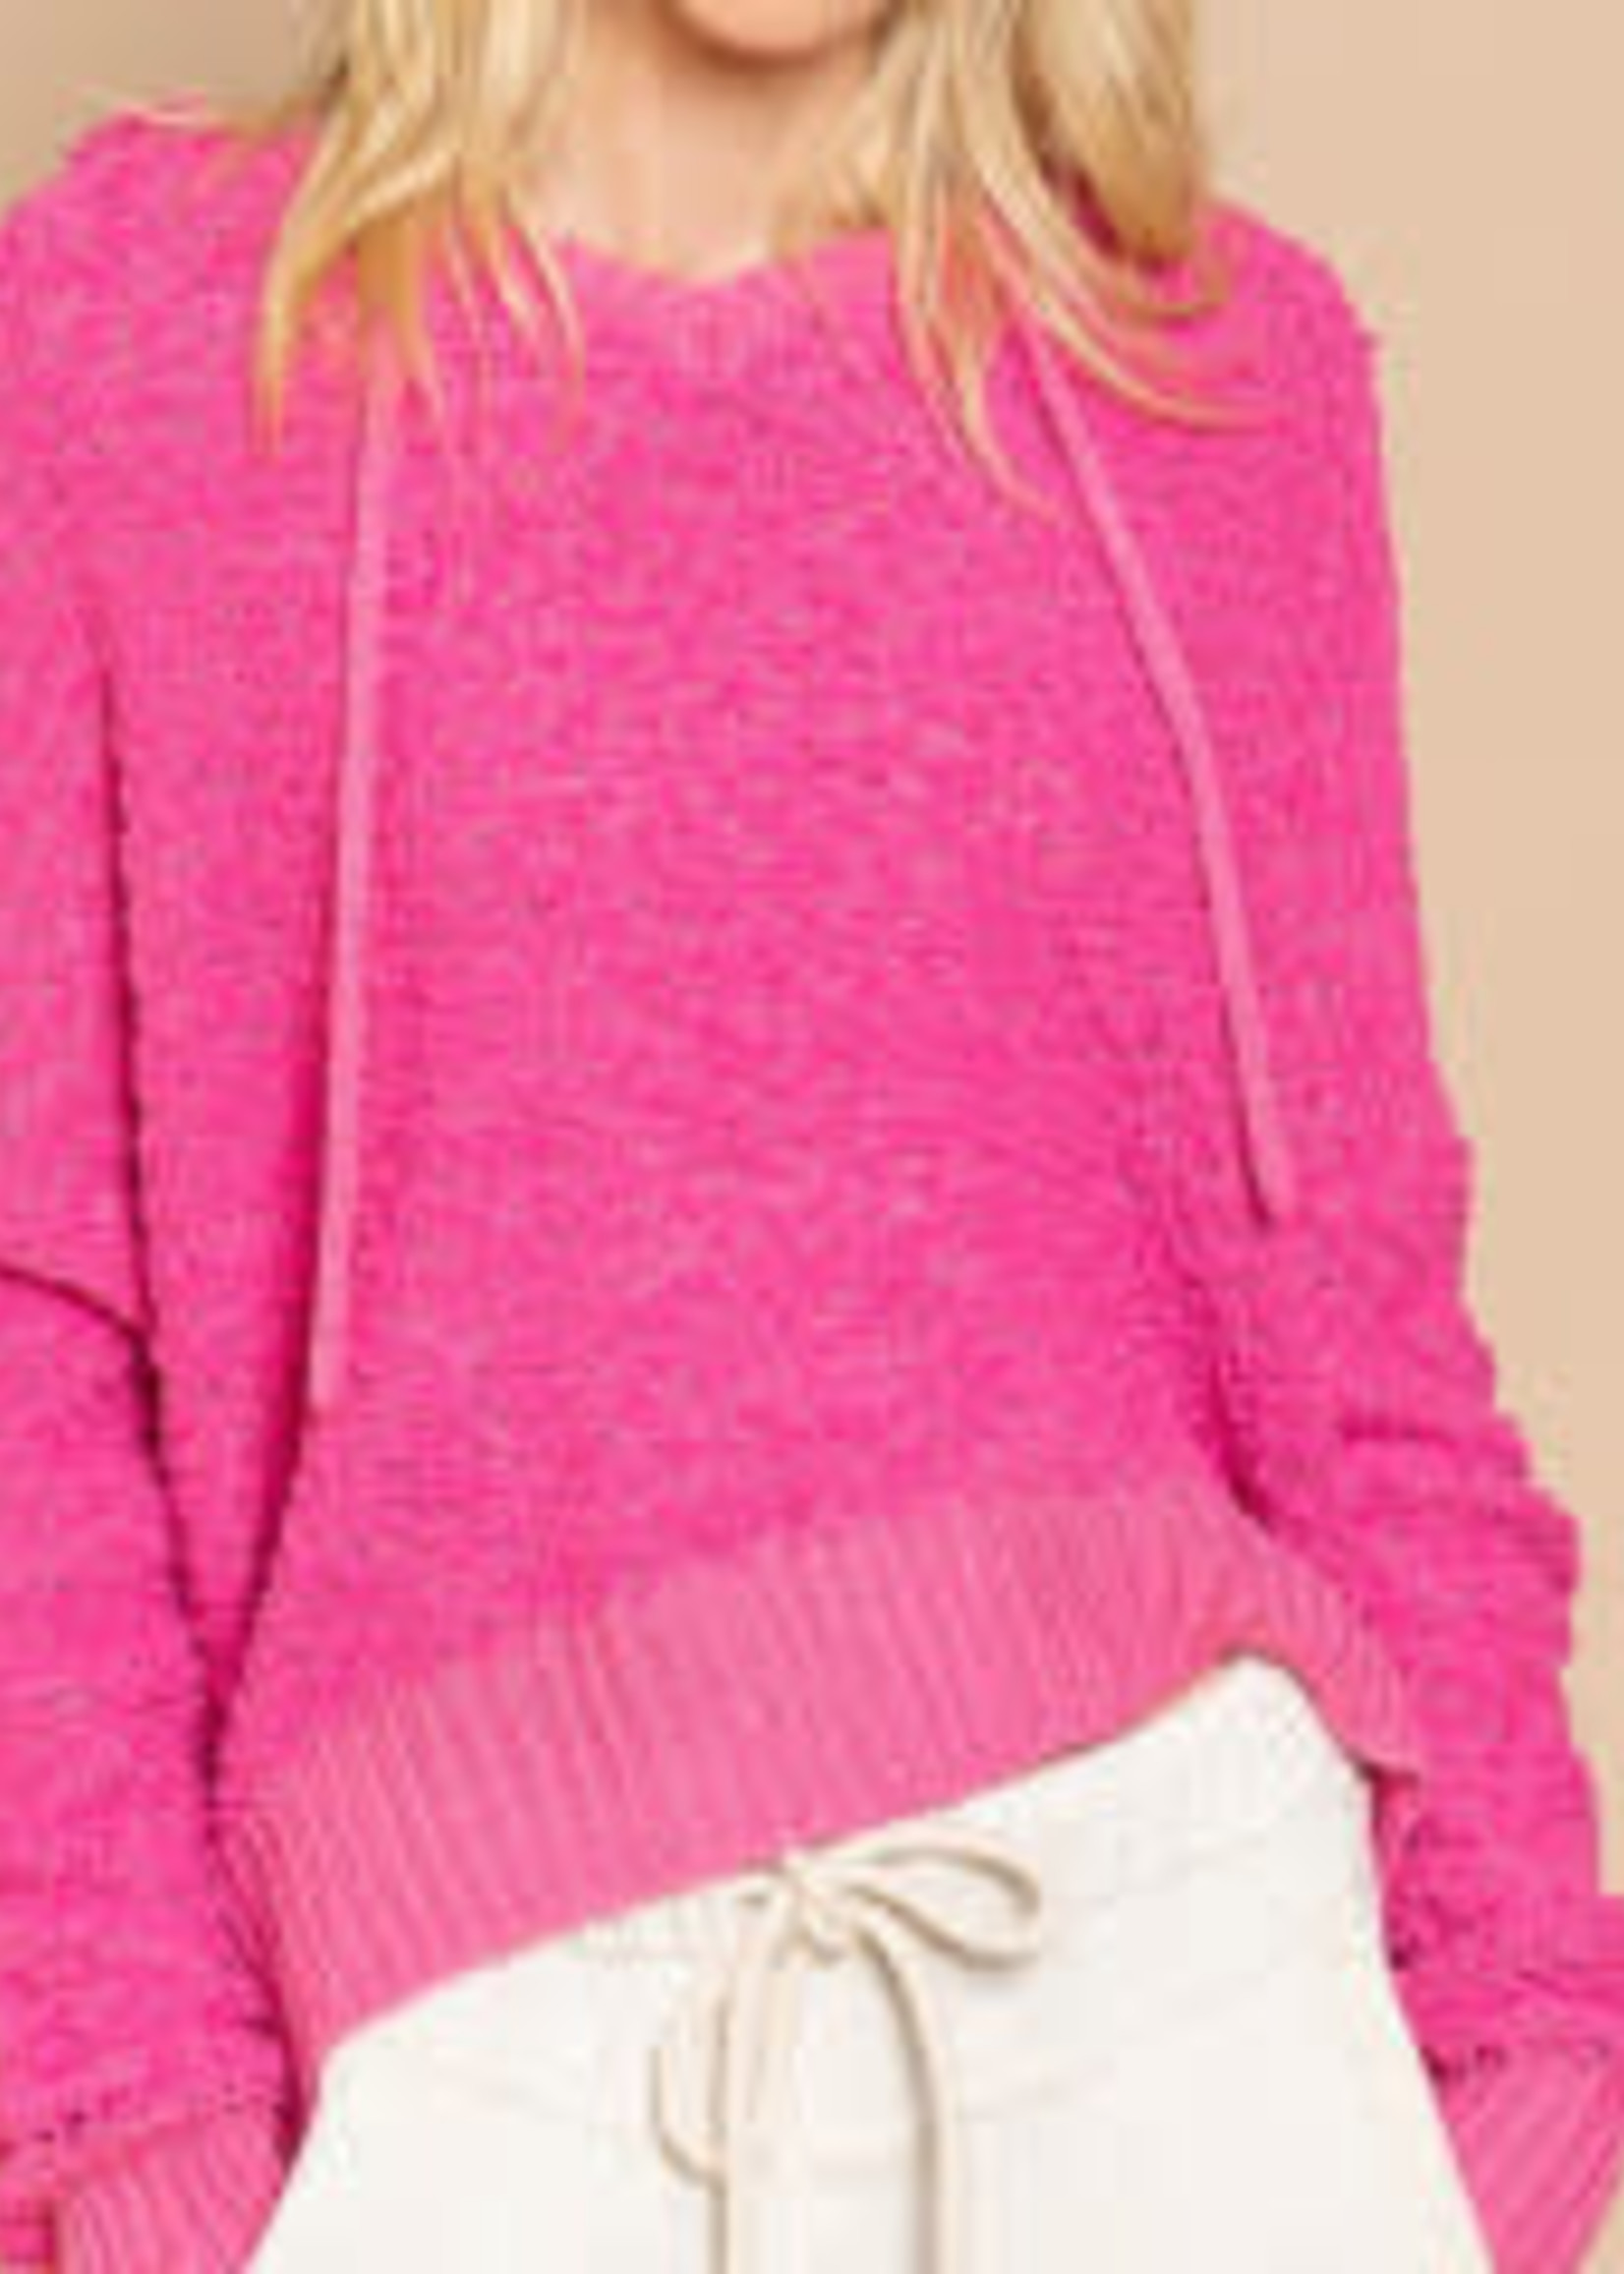 Popcorn Texture Hoodie, Hot Pink, Large